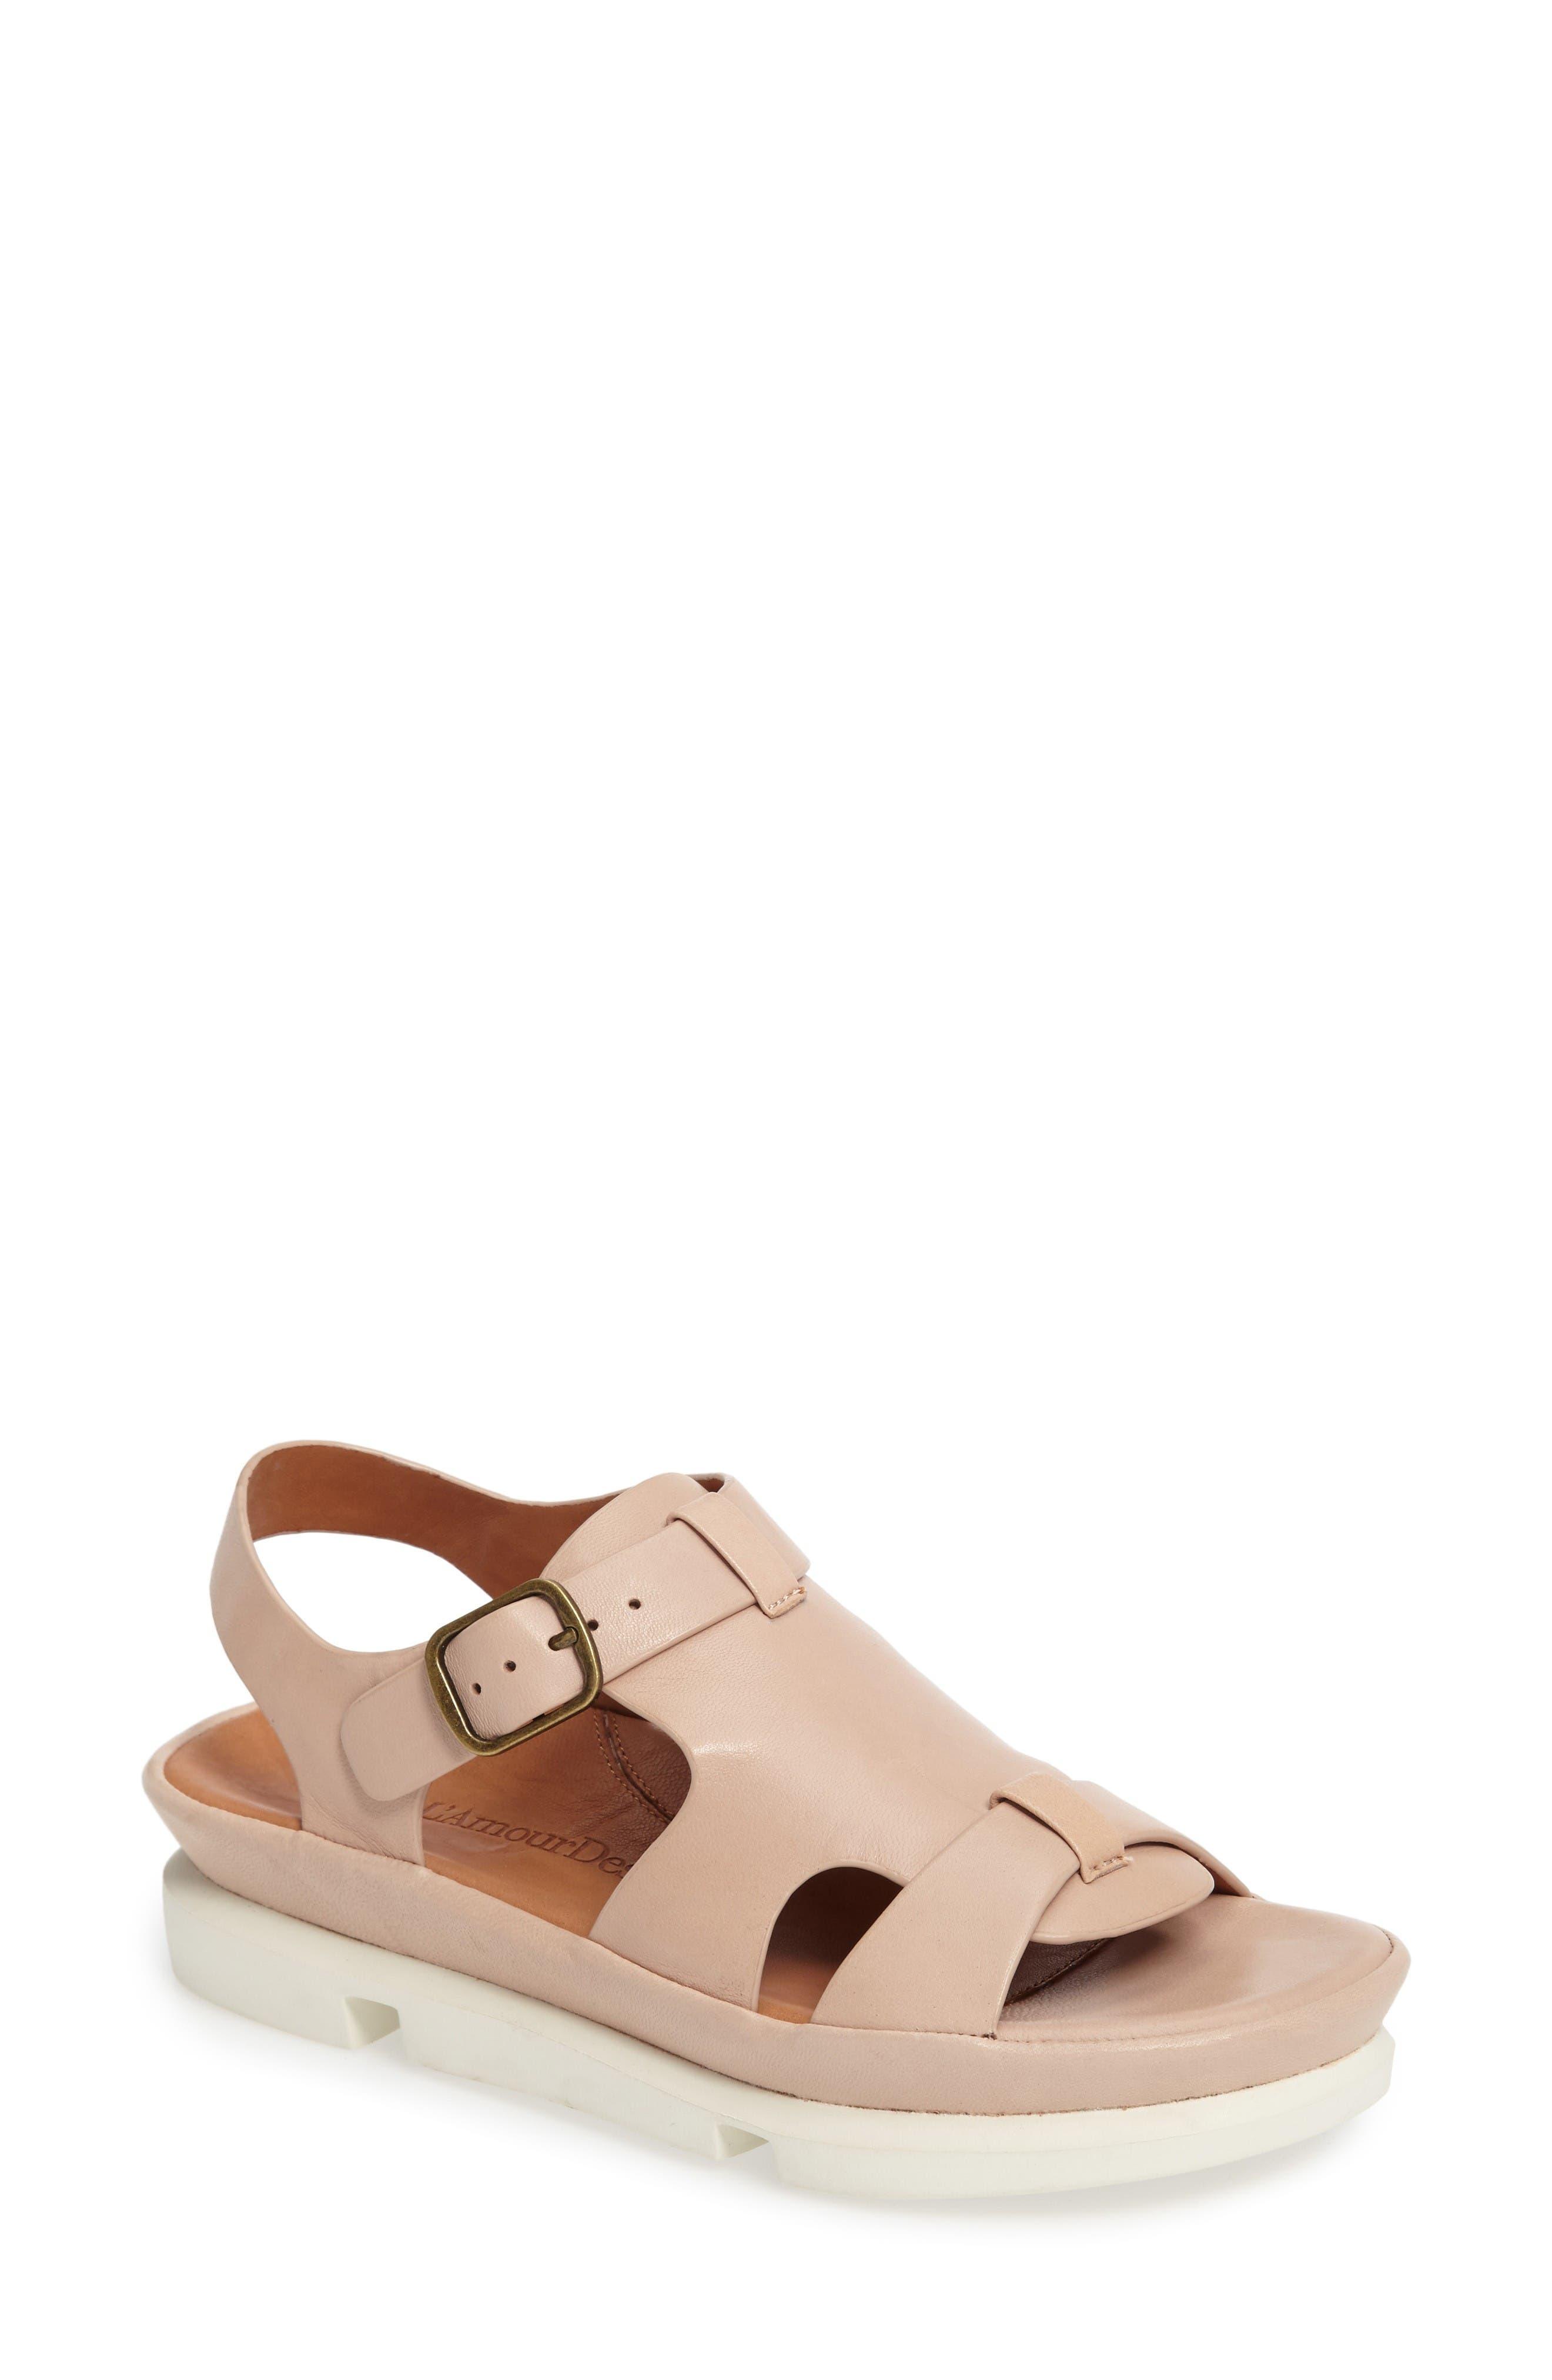 Villefranche Sandal,                         Main,                         color, Nude Leather